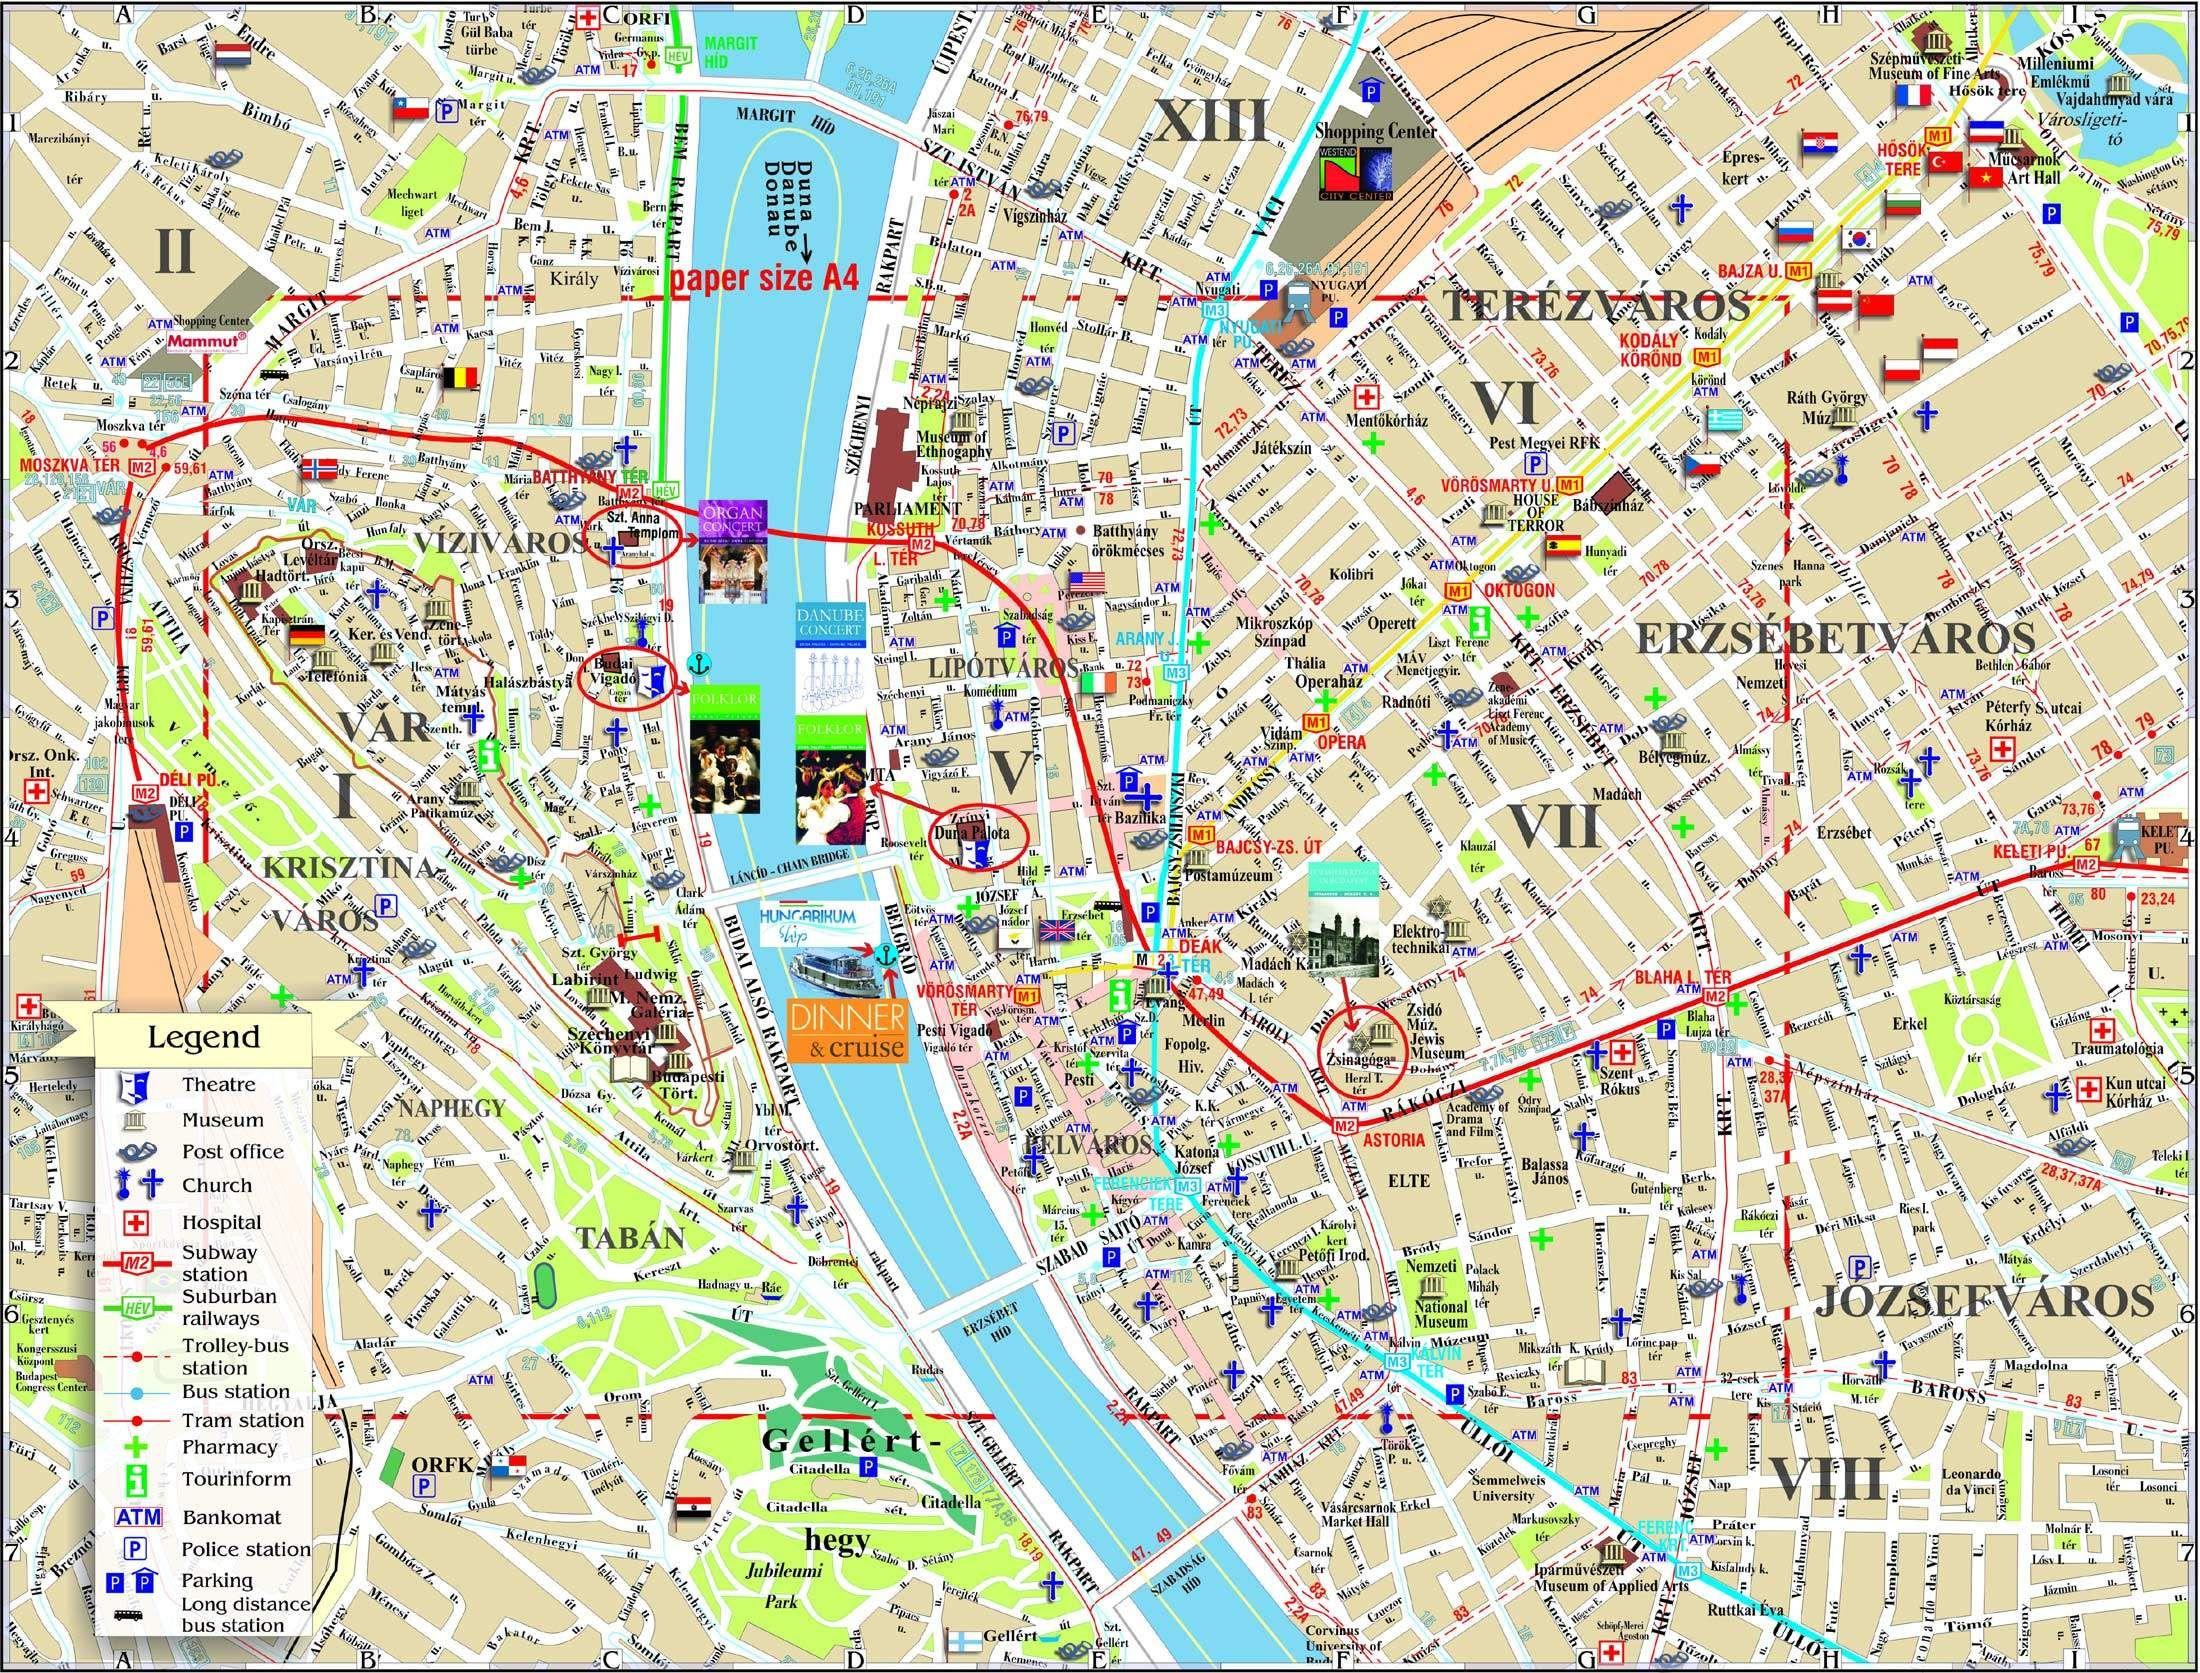 Mapa Turistico Budapest Pdf.Budapest Mapa Turistico Pdf Buscar Con Google En 2019